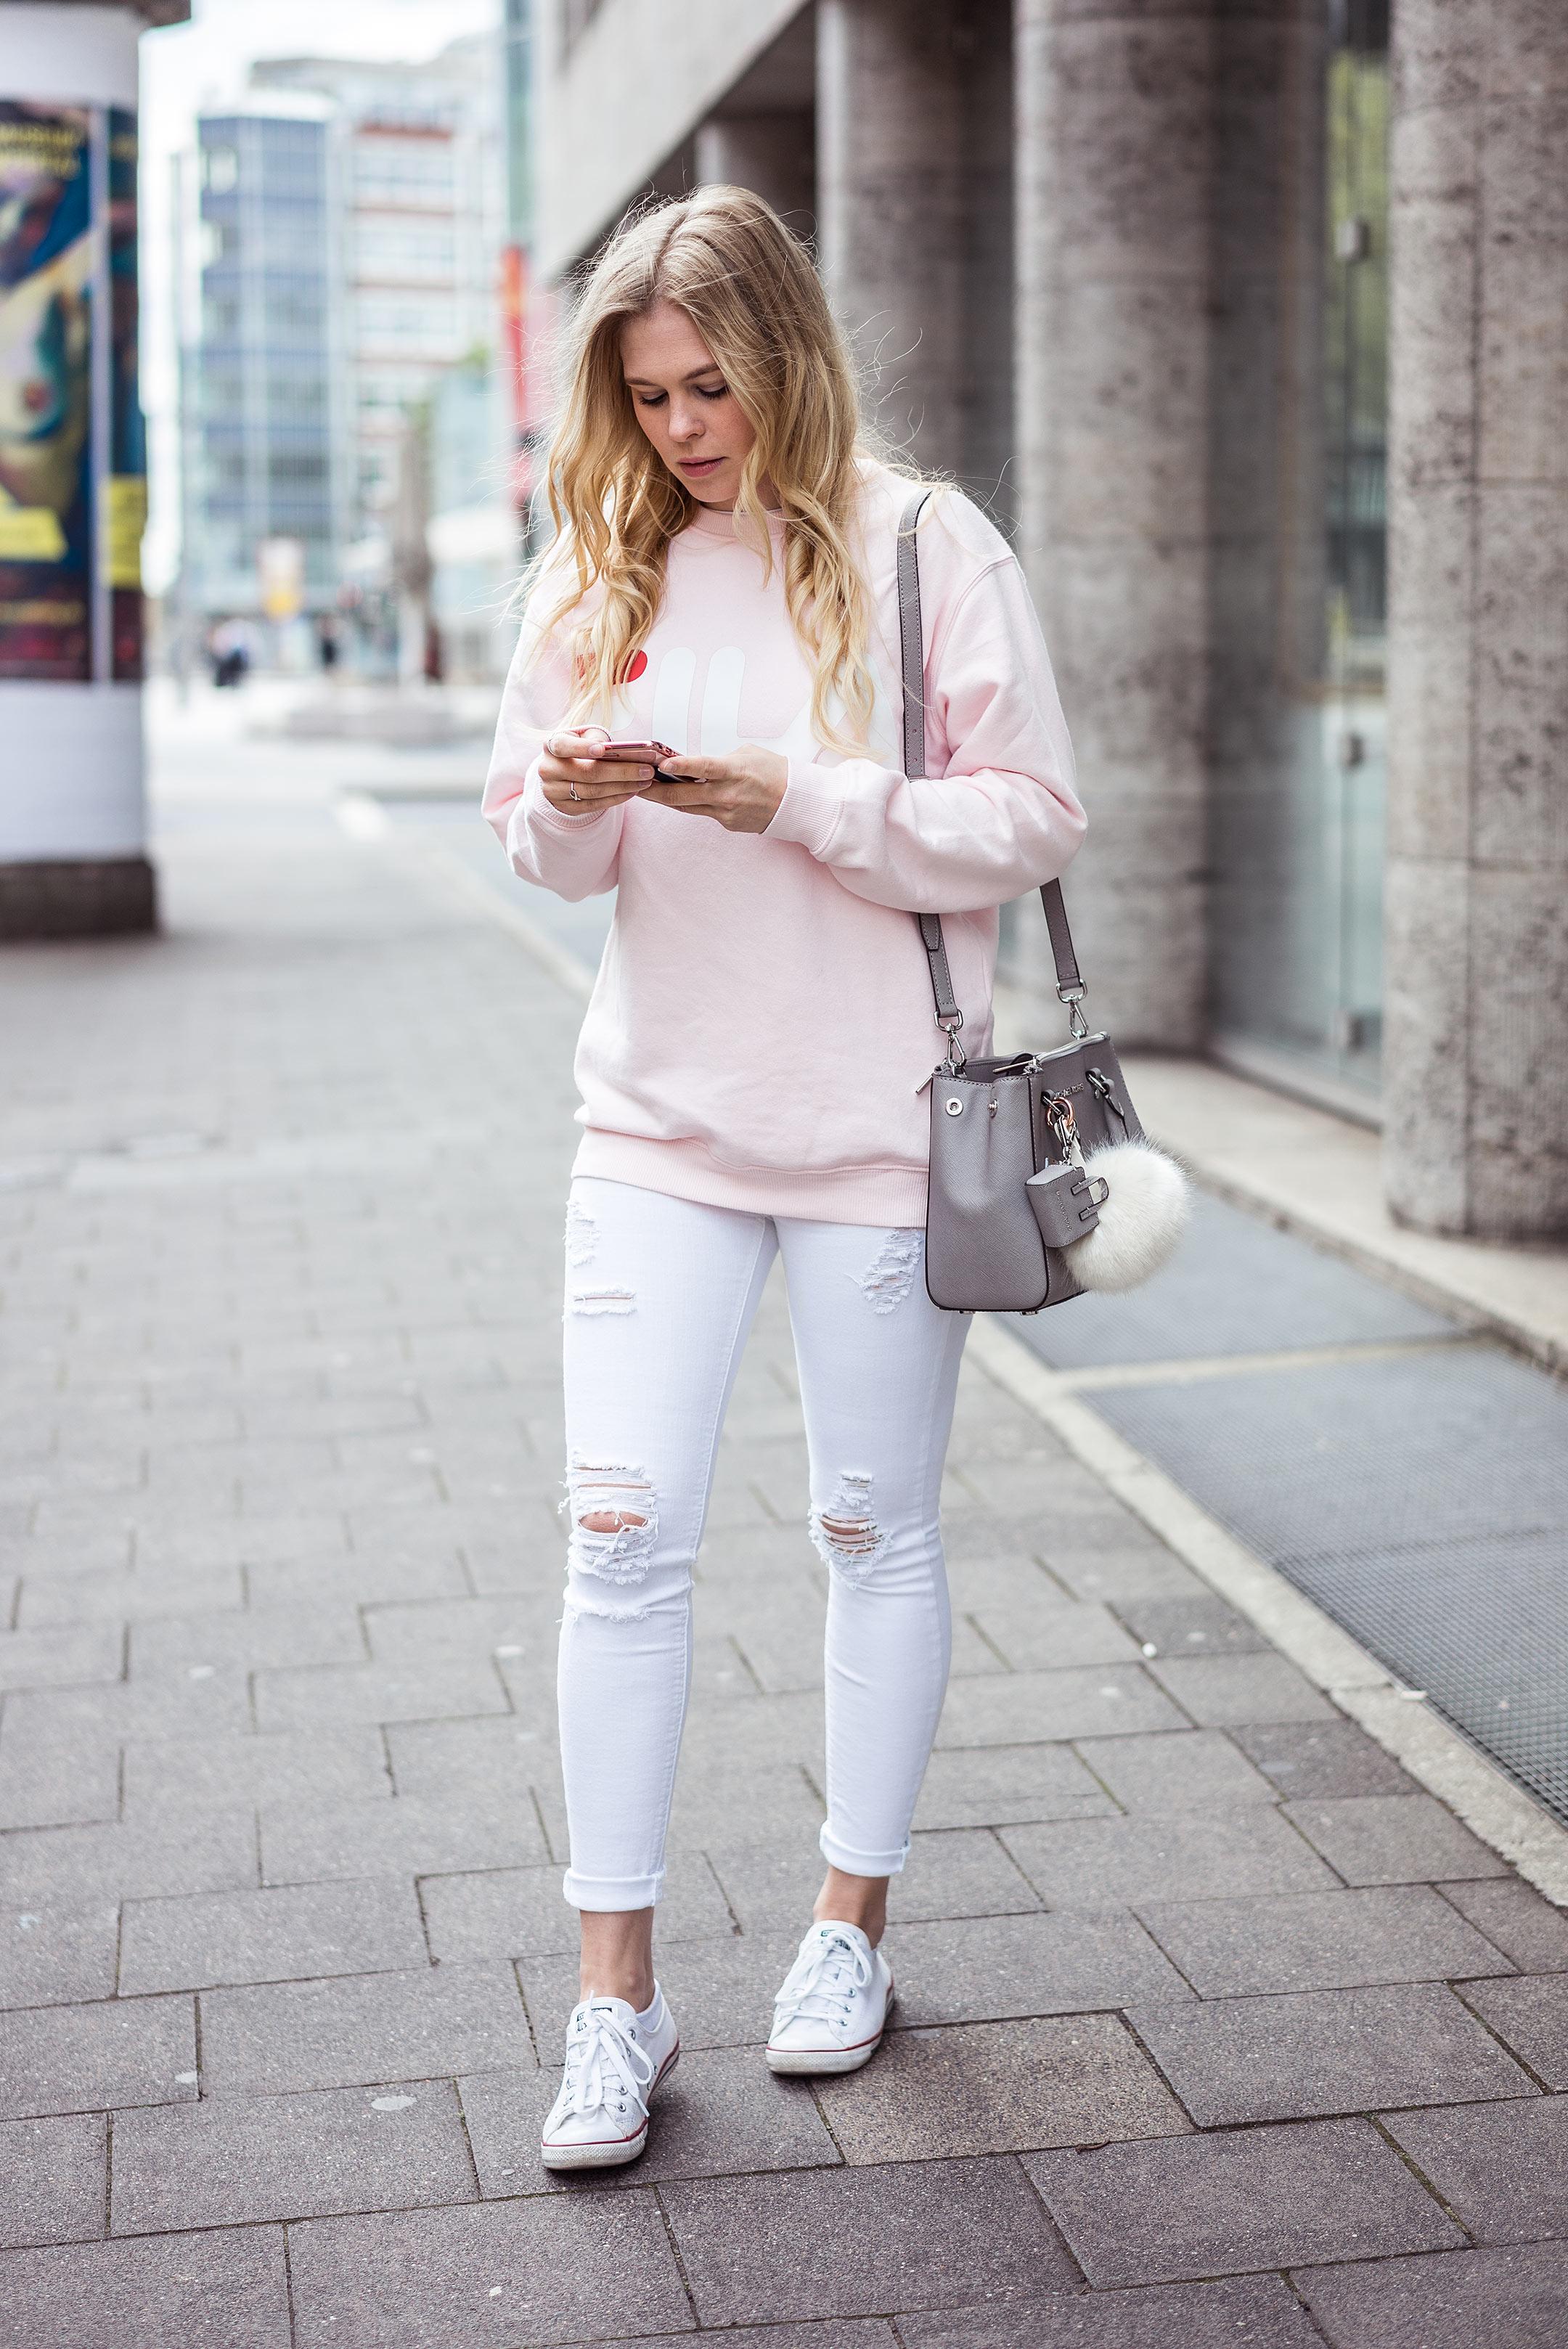 Sunnyinga Outfit Fila Sweater Rosa Skinny Jeans Converse Düsseldorf Streetstyle